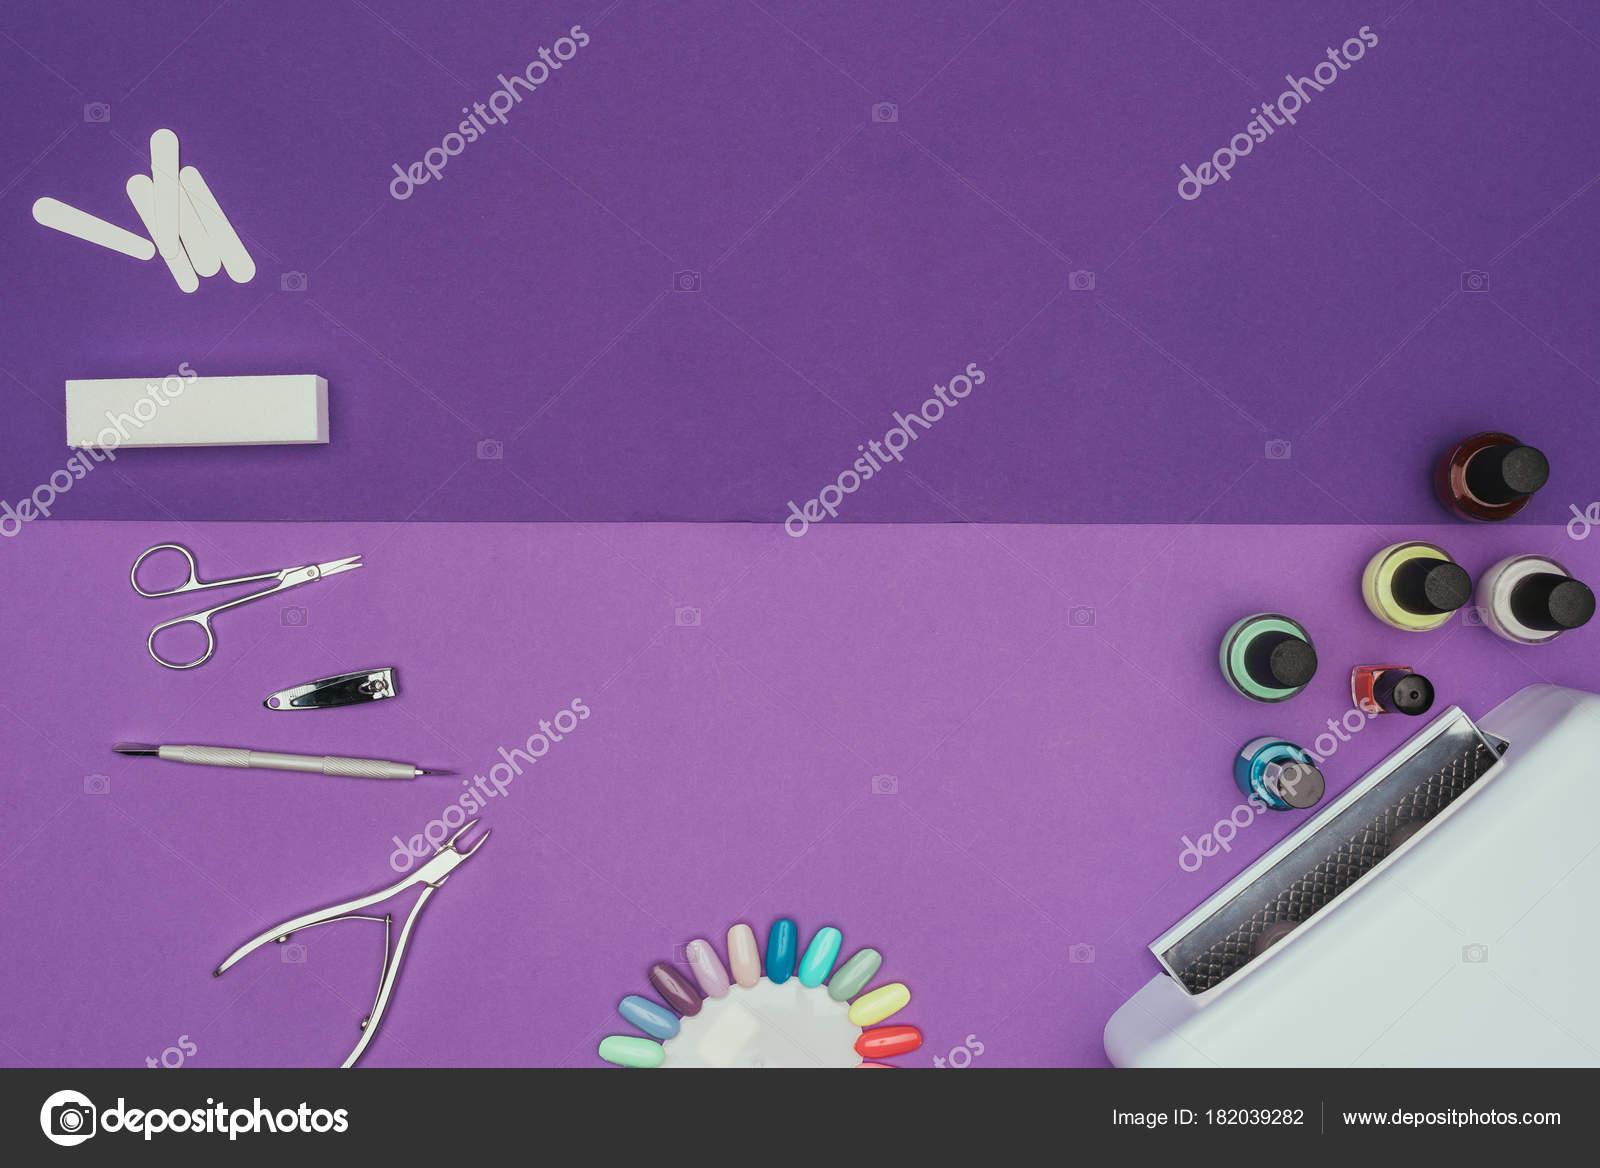 Lampada Scrivania Viola : Vista superiore strumenti manicure lampada sul tavolo viola u2014 foto